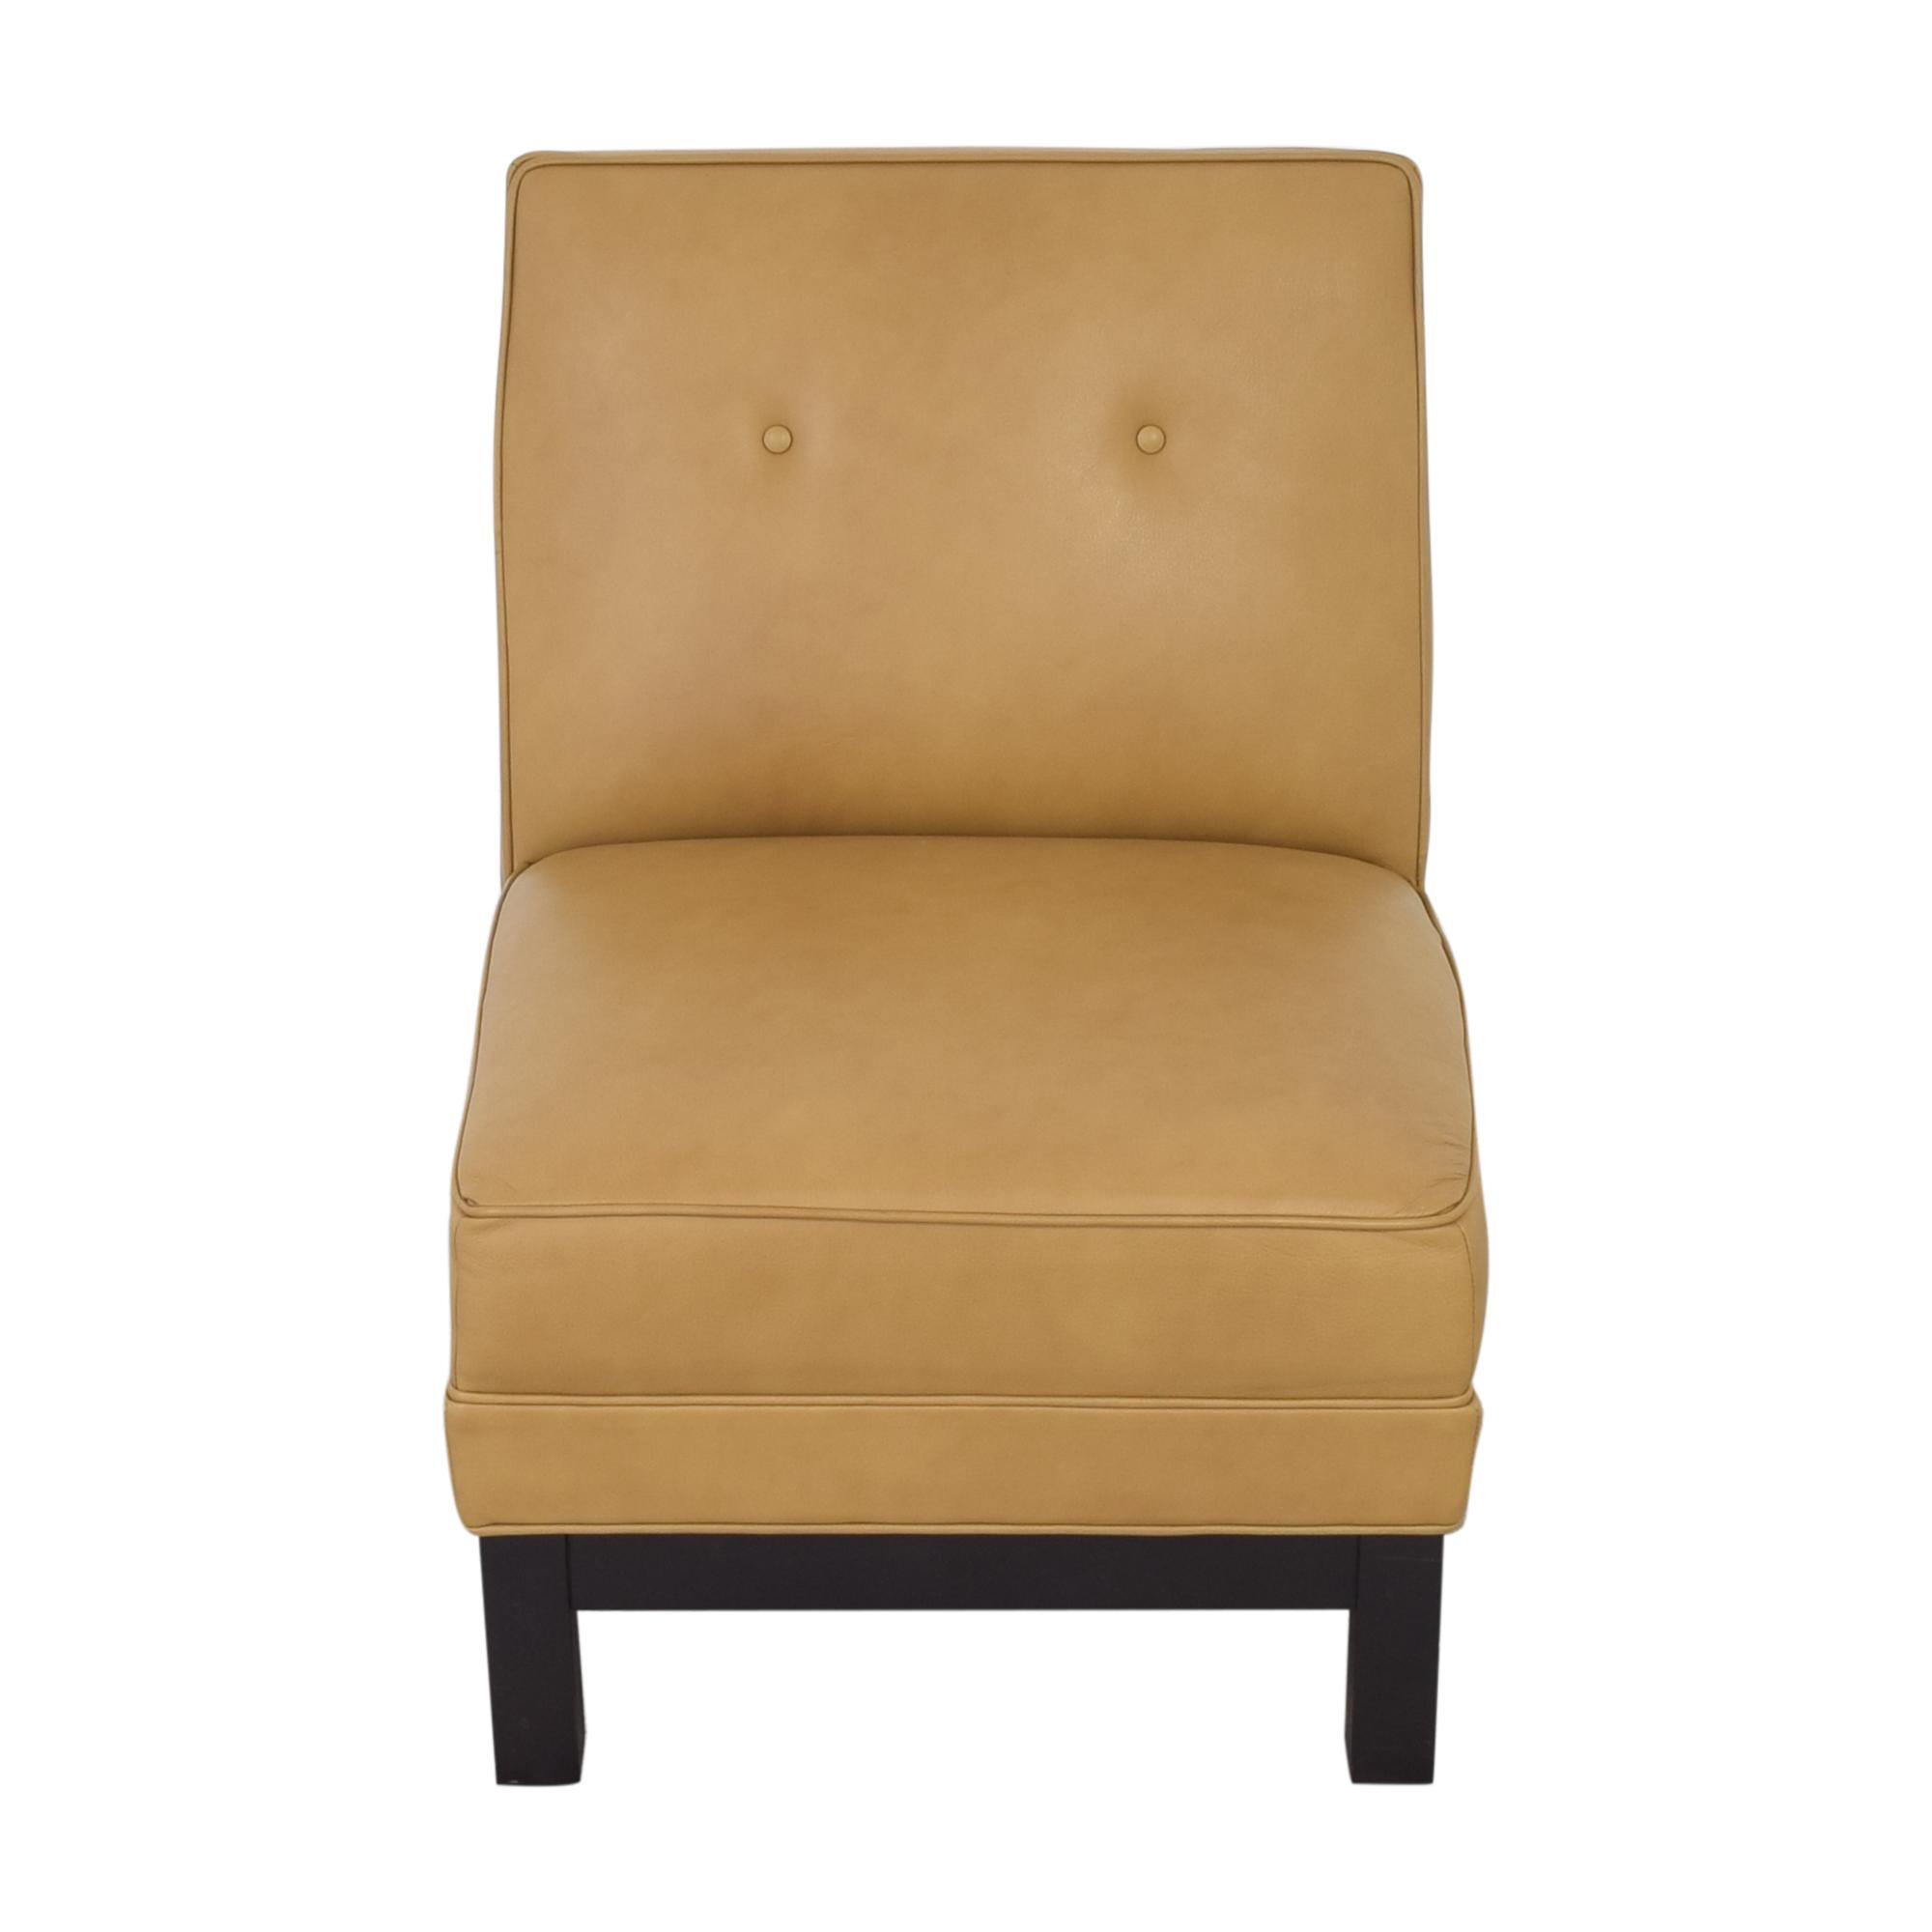 Mitchell Gold + Bob Williams Mitchell Gold + Bob Williams Liana Chair